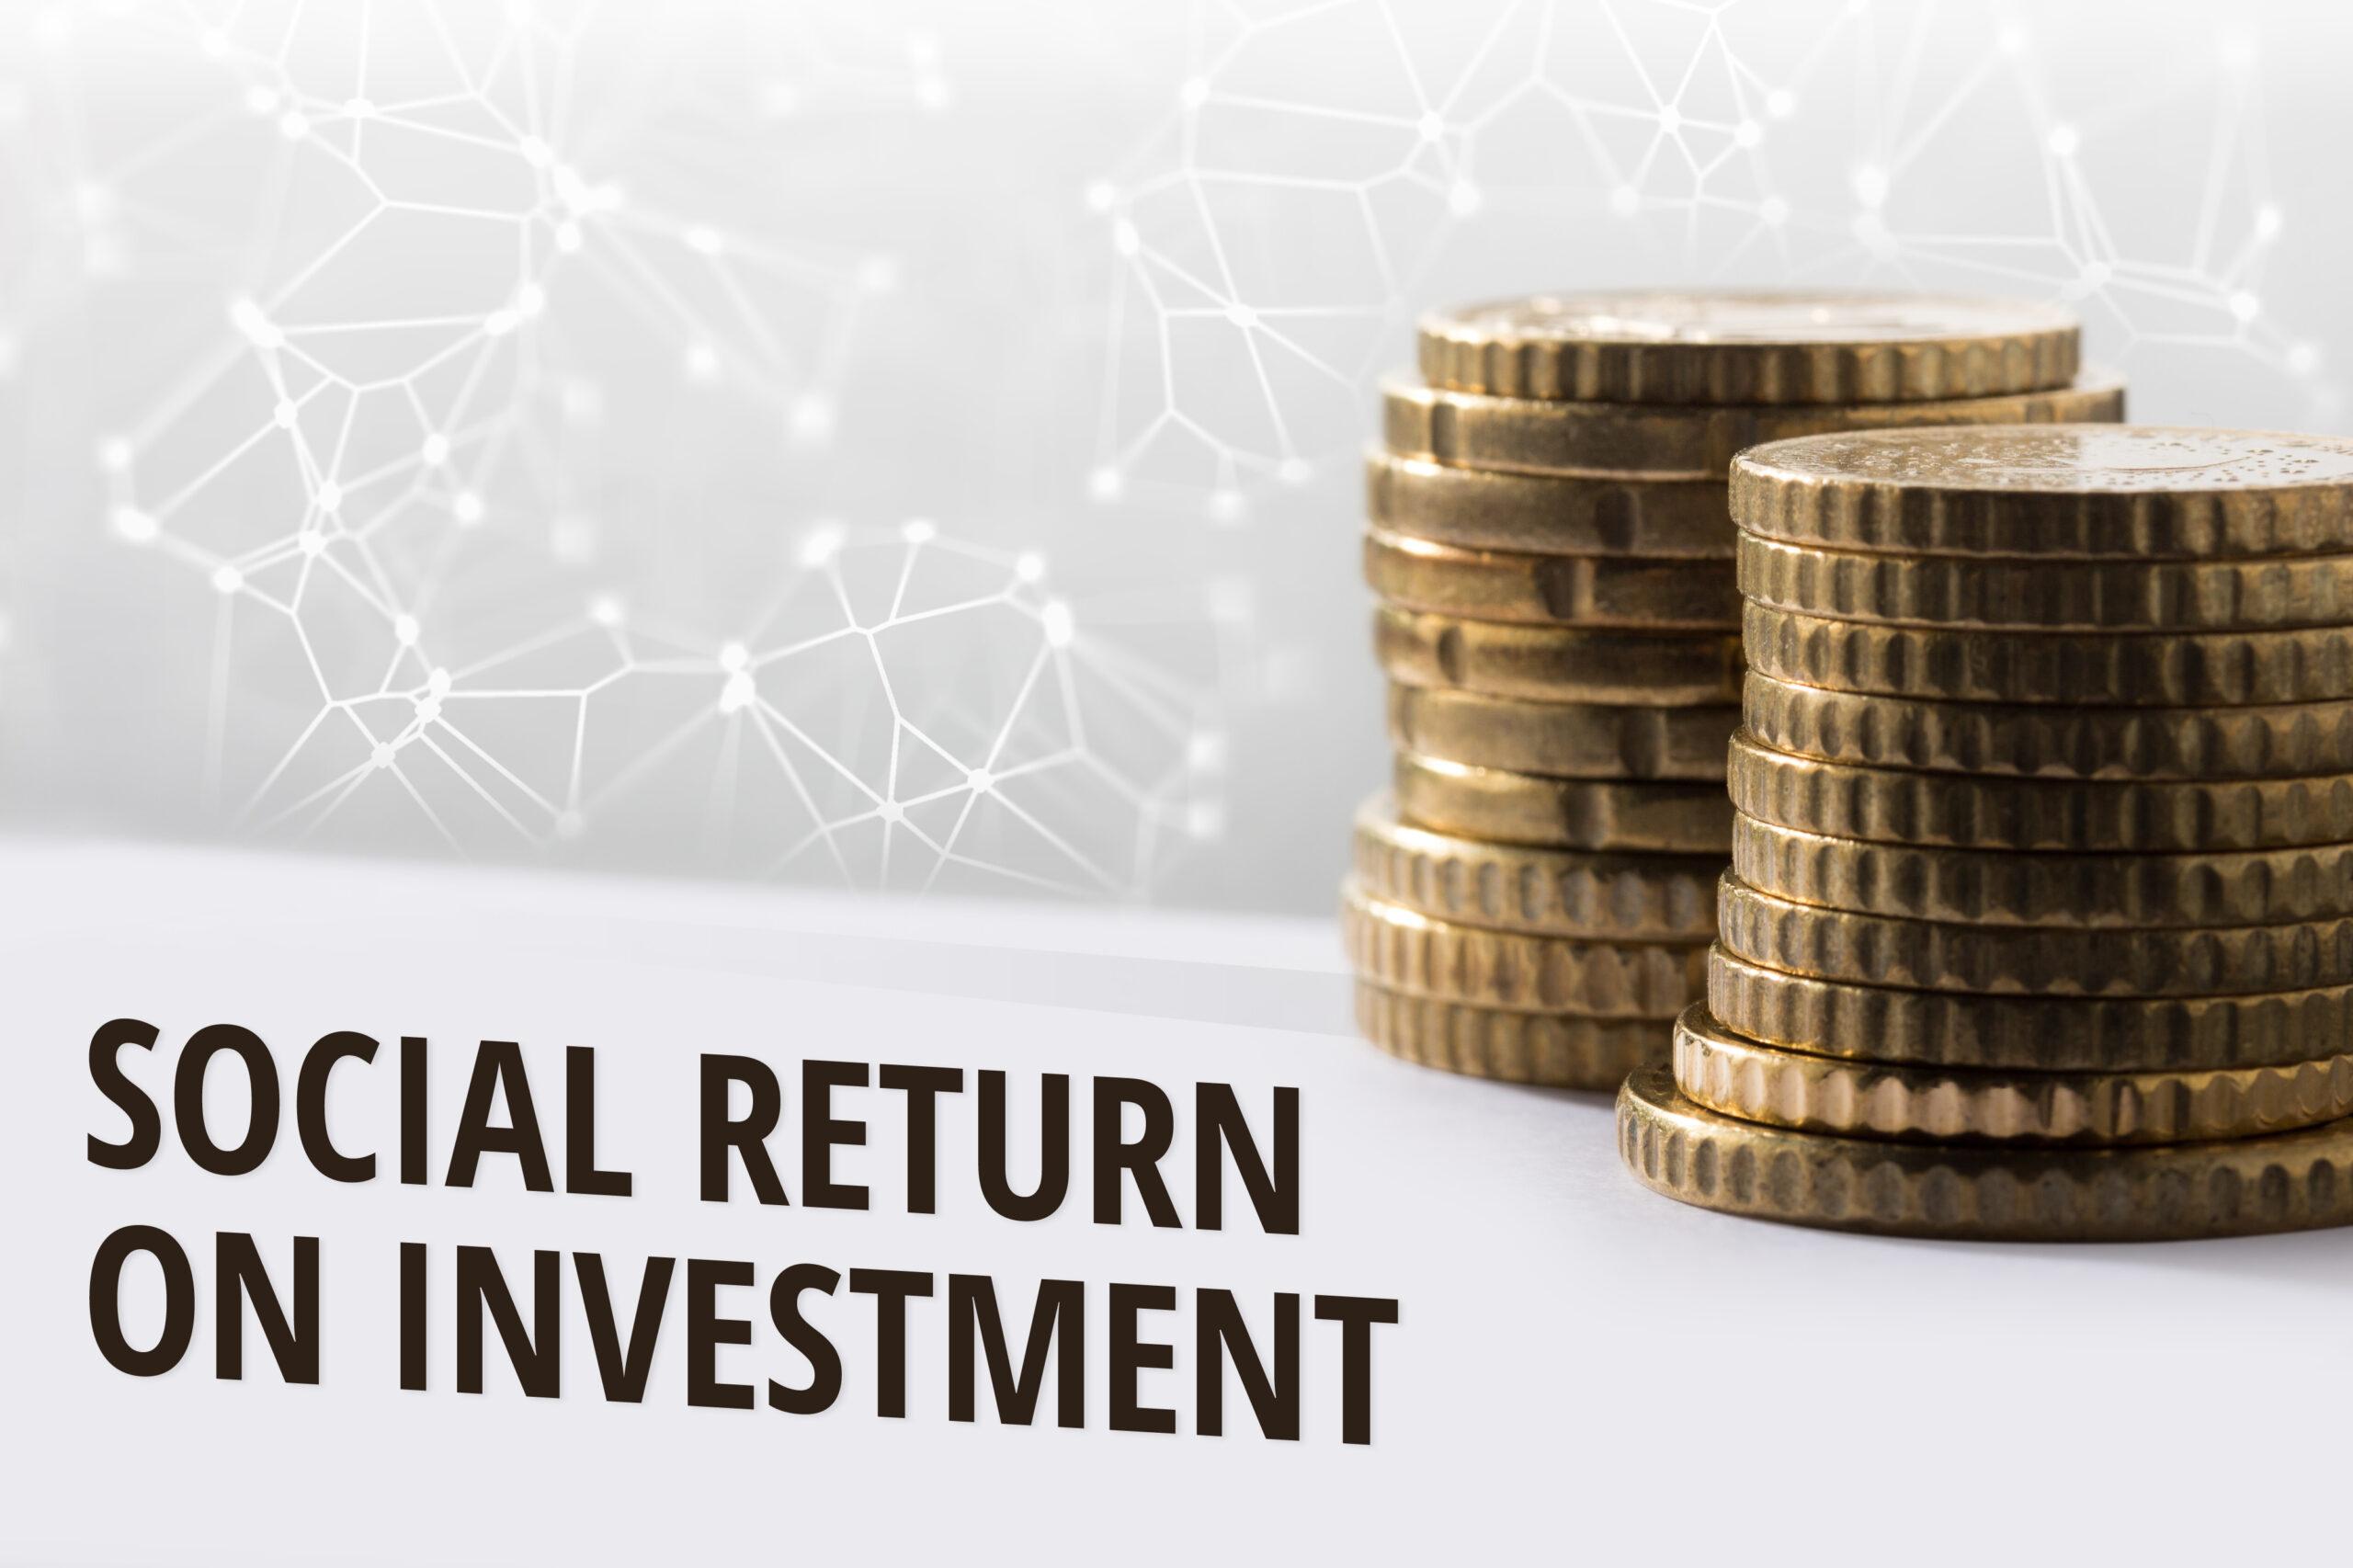 SET-up agenda_Meet-up: Social Return on Investment (SROI)